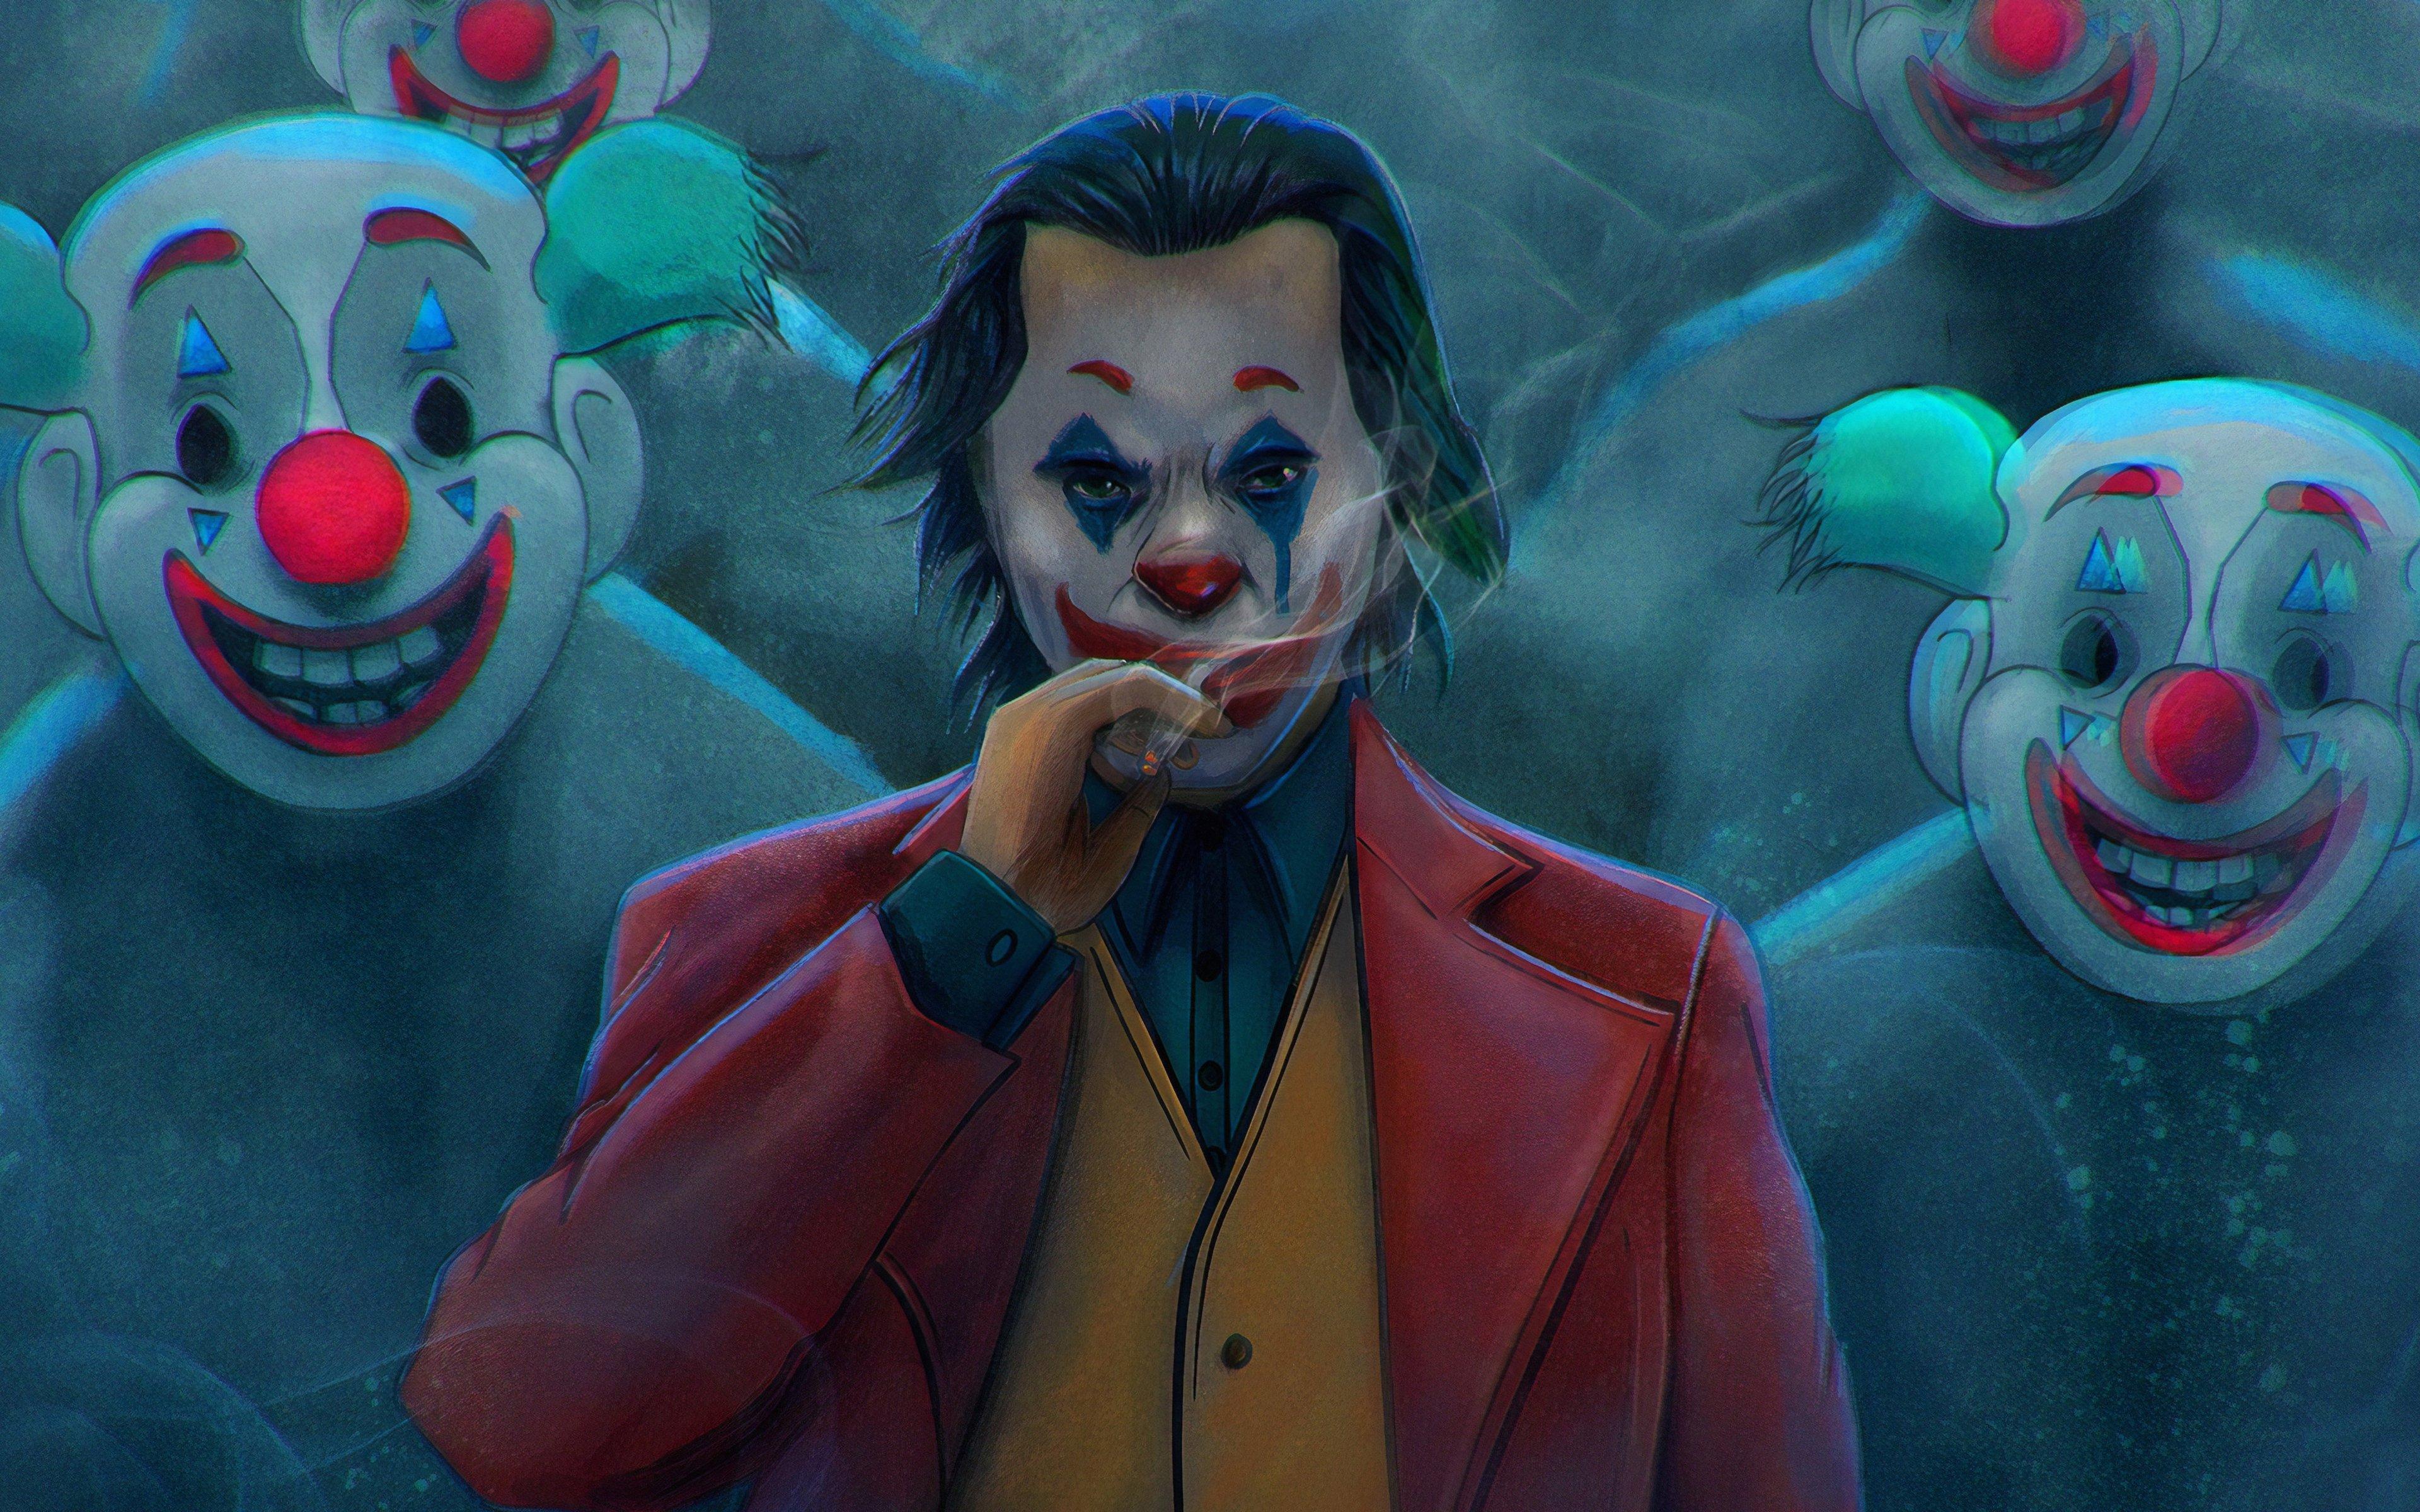 Fondos de pantalla Joker con cigarro Fanart